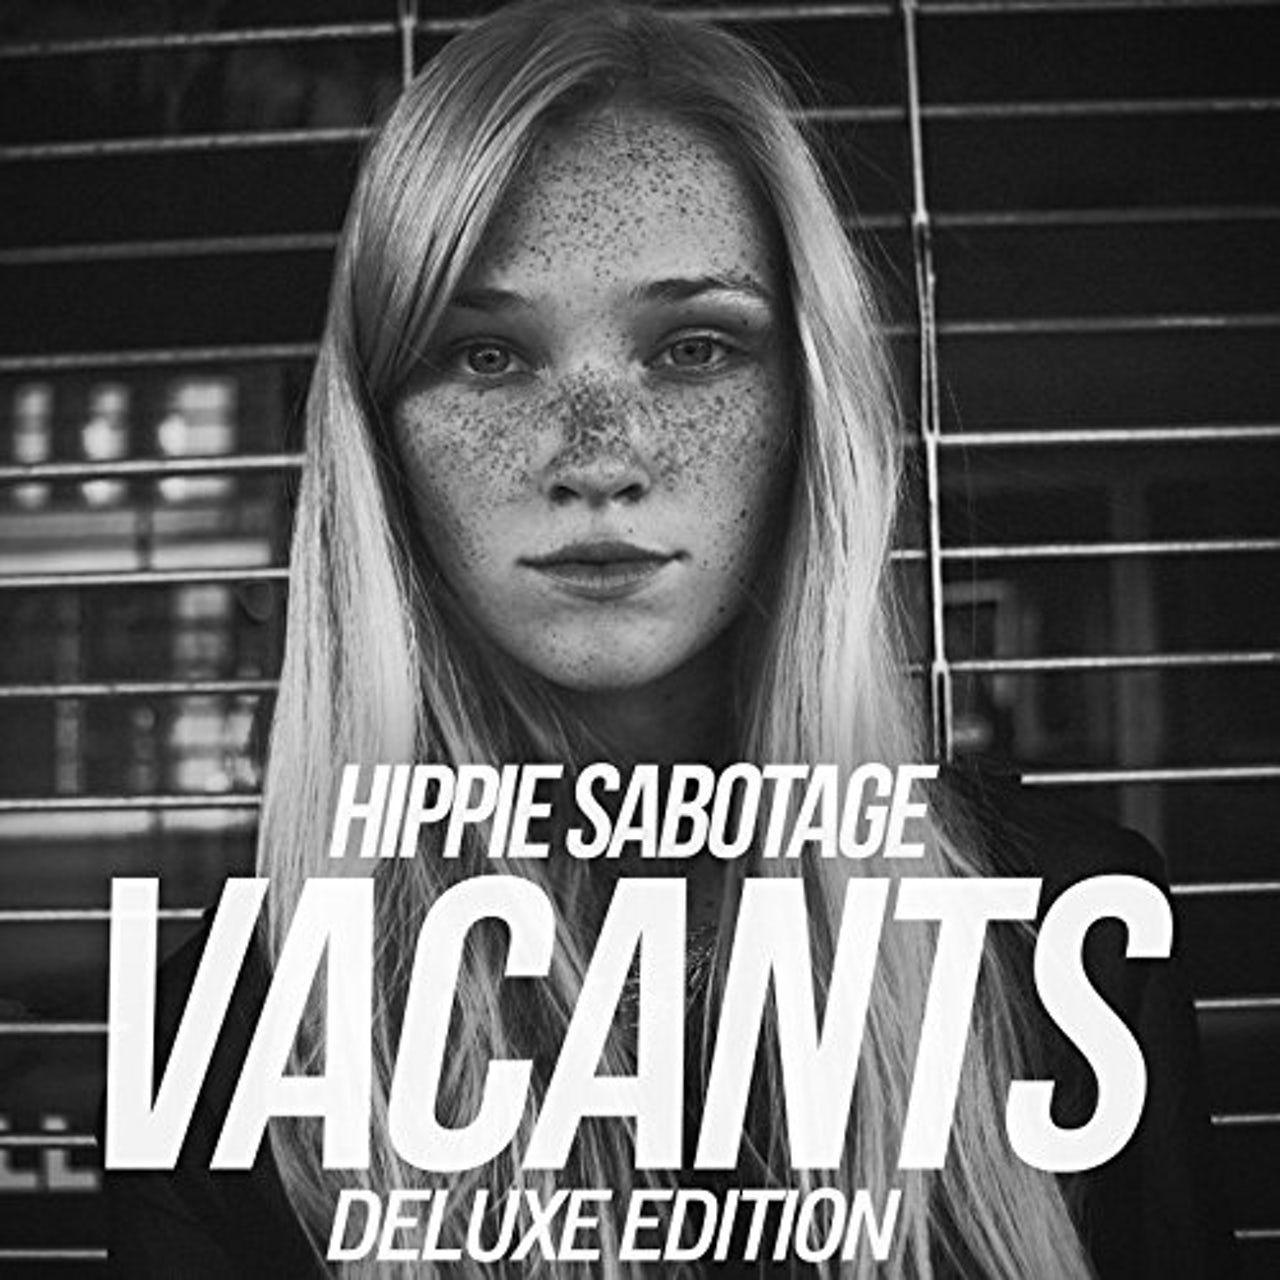 hippie sabotage providence album cover